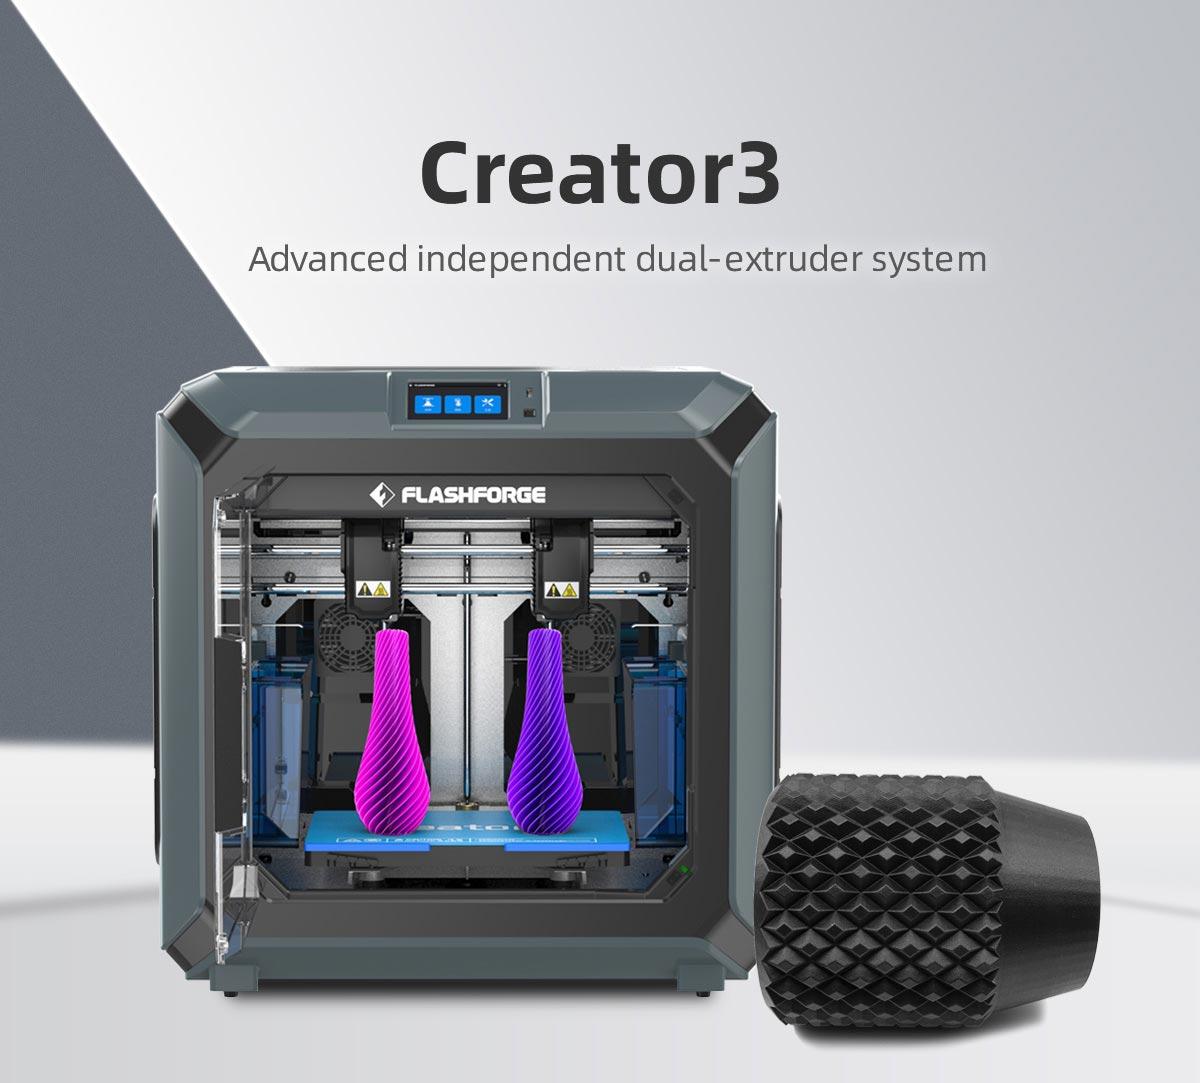 Flashforge Creator 3 3d printer with advanced independent dual-extruder system | Flashforgeshop